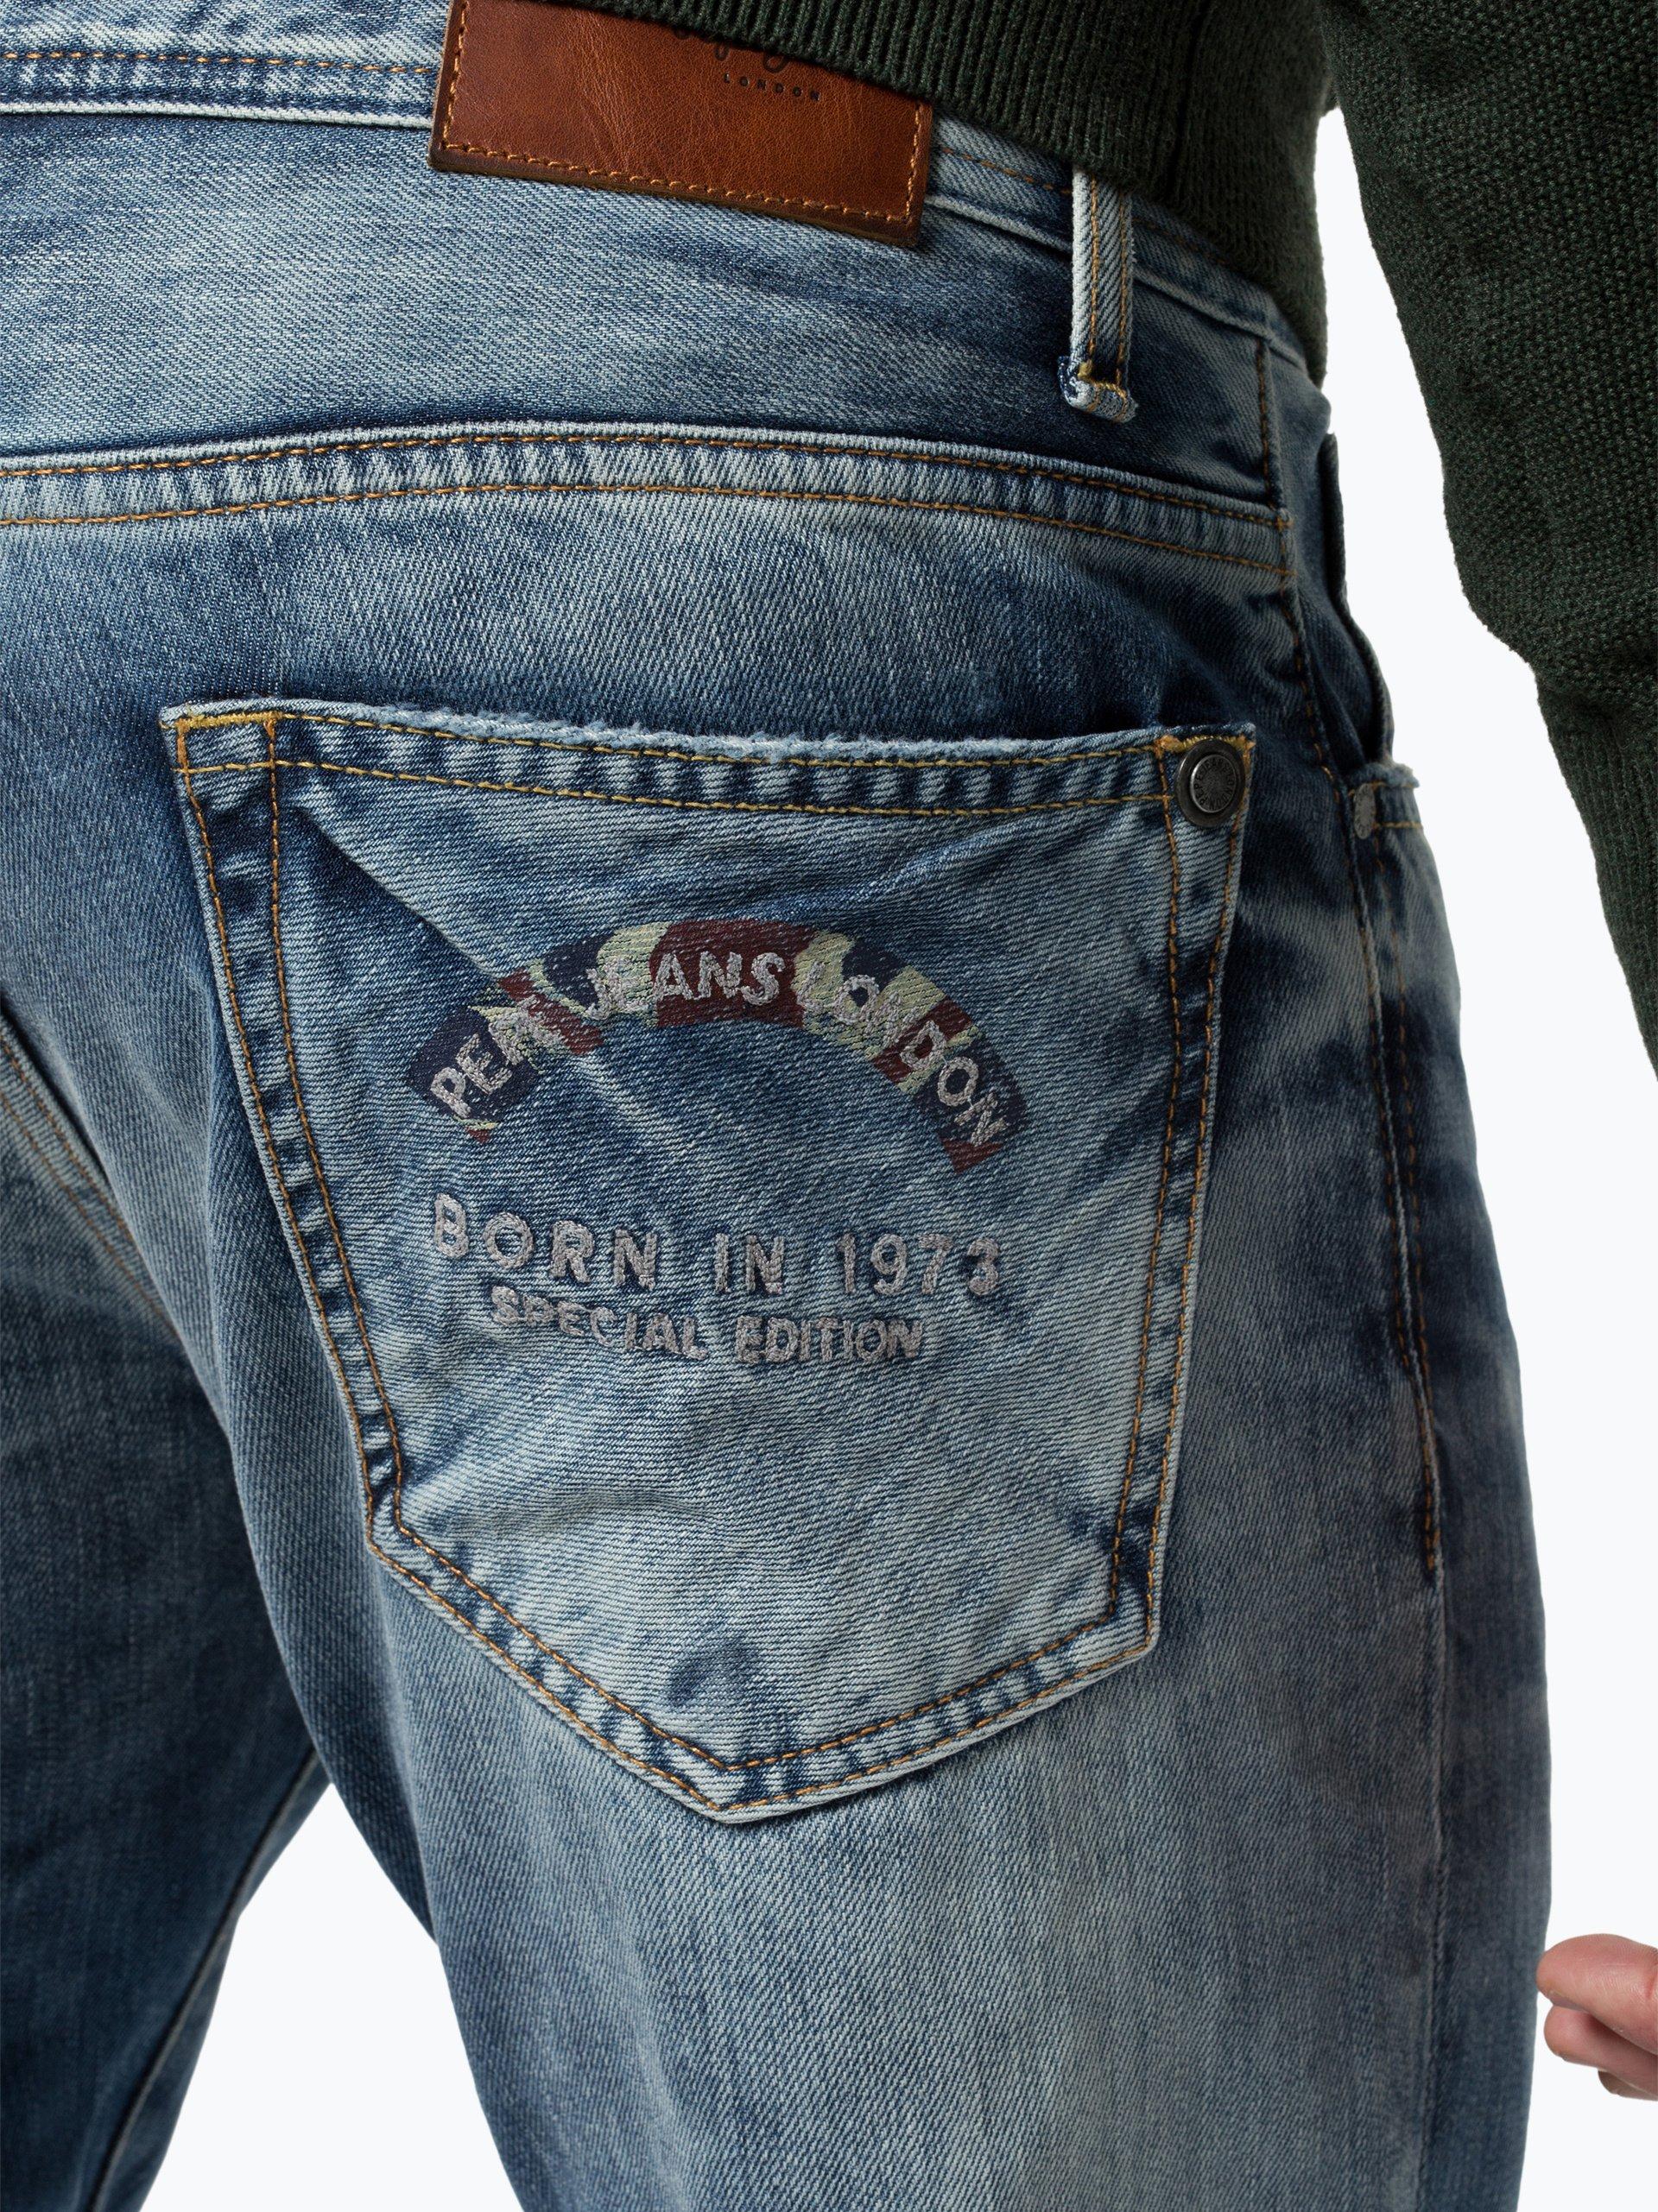 pepe jeans herren jeans men edition online kaufen vangraaf com. Black Bedroom Furniture Sets. Home Design Ideas